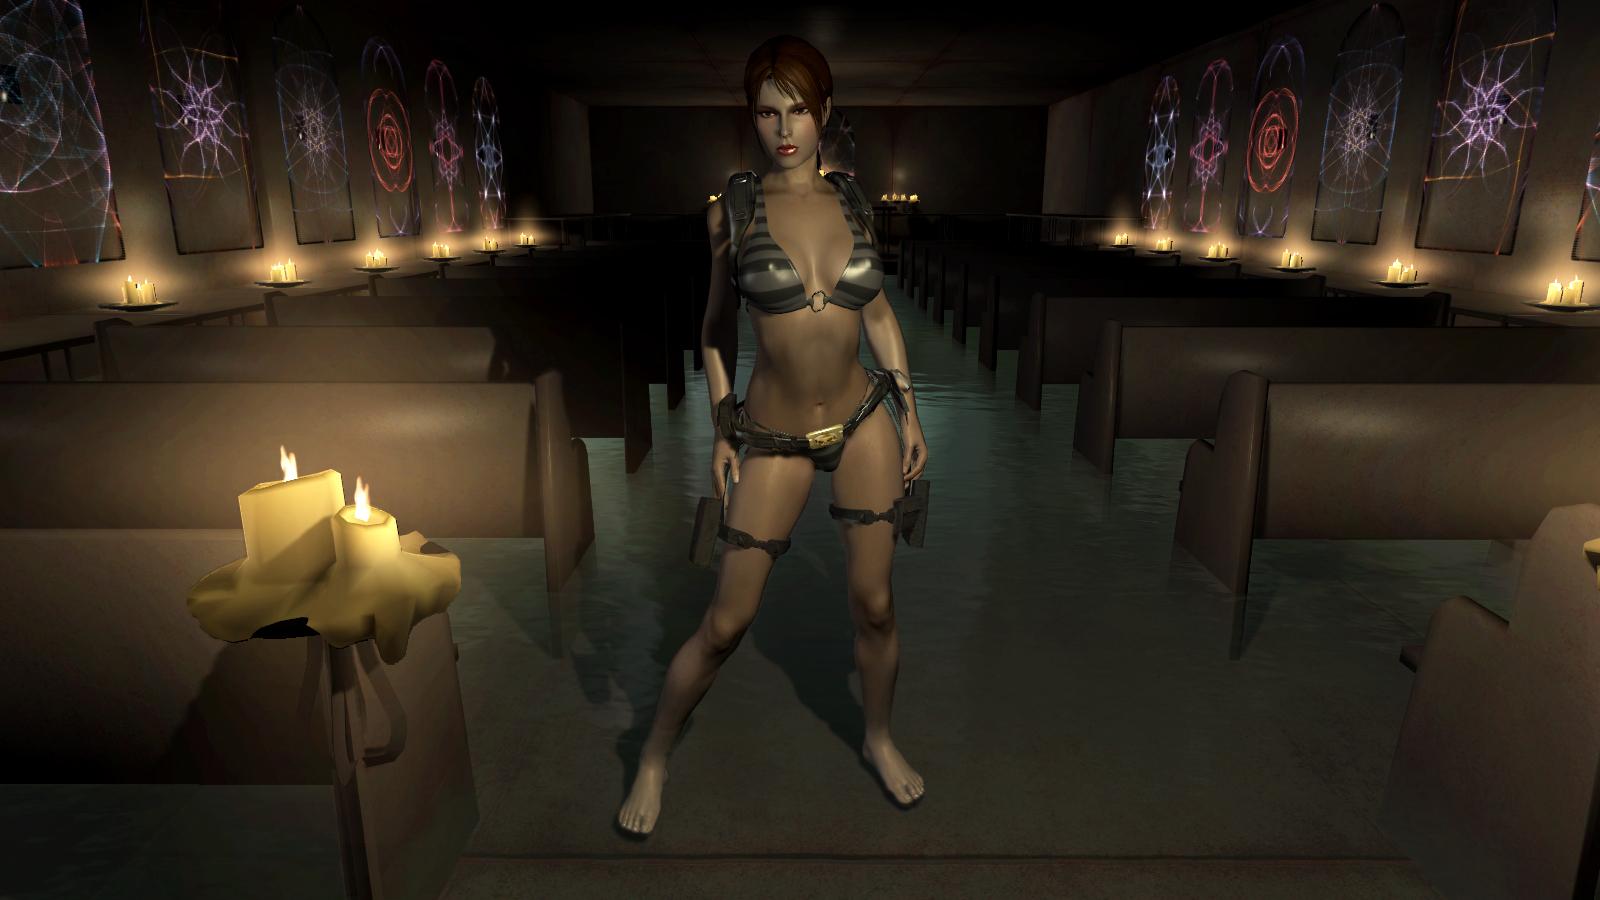 Lara croftгђђnude mod nackt comic